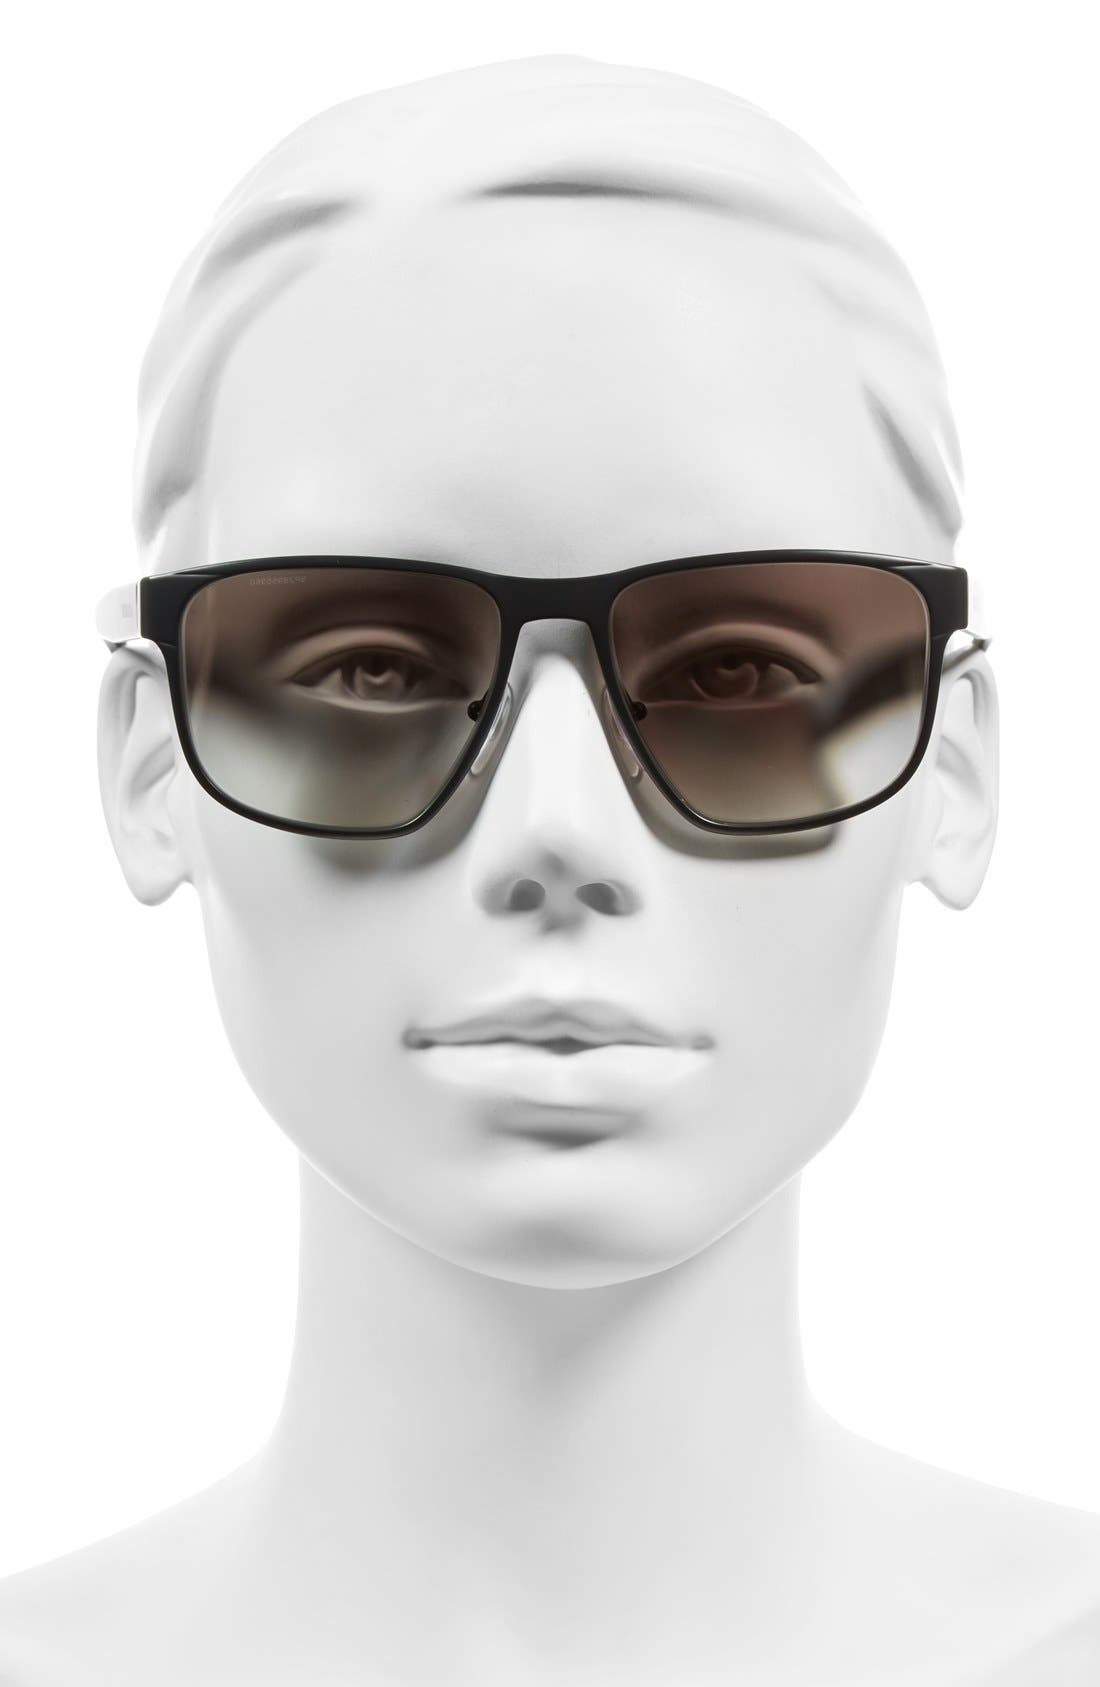 55mm Sunglasses,                             Alternate thumbnail 2, color,                             022